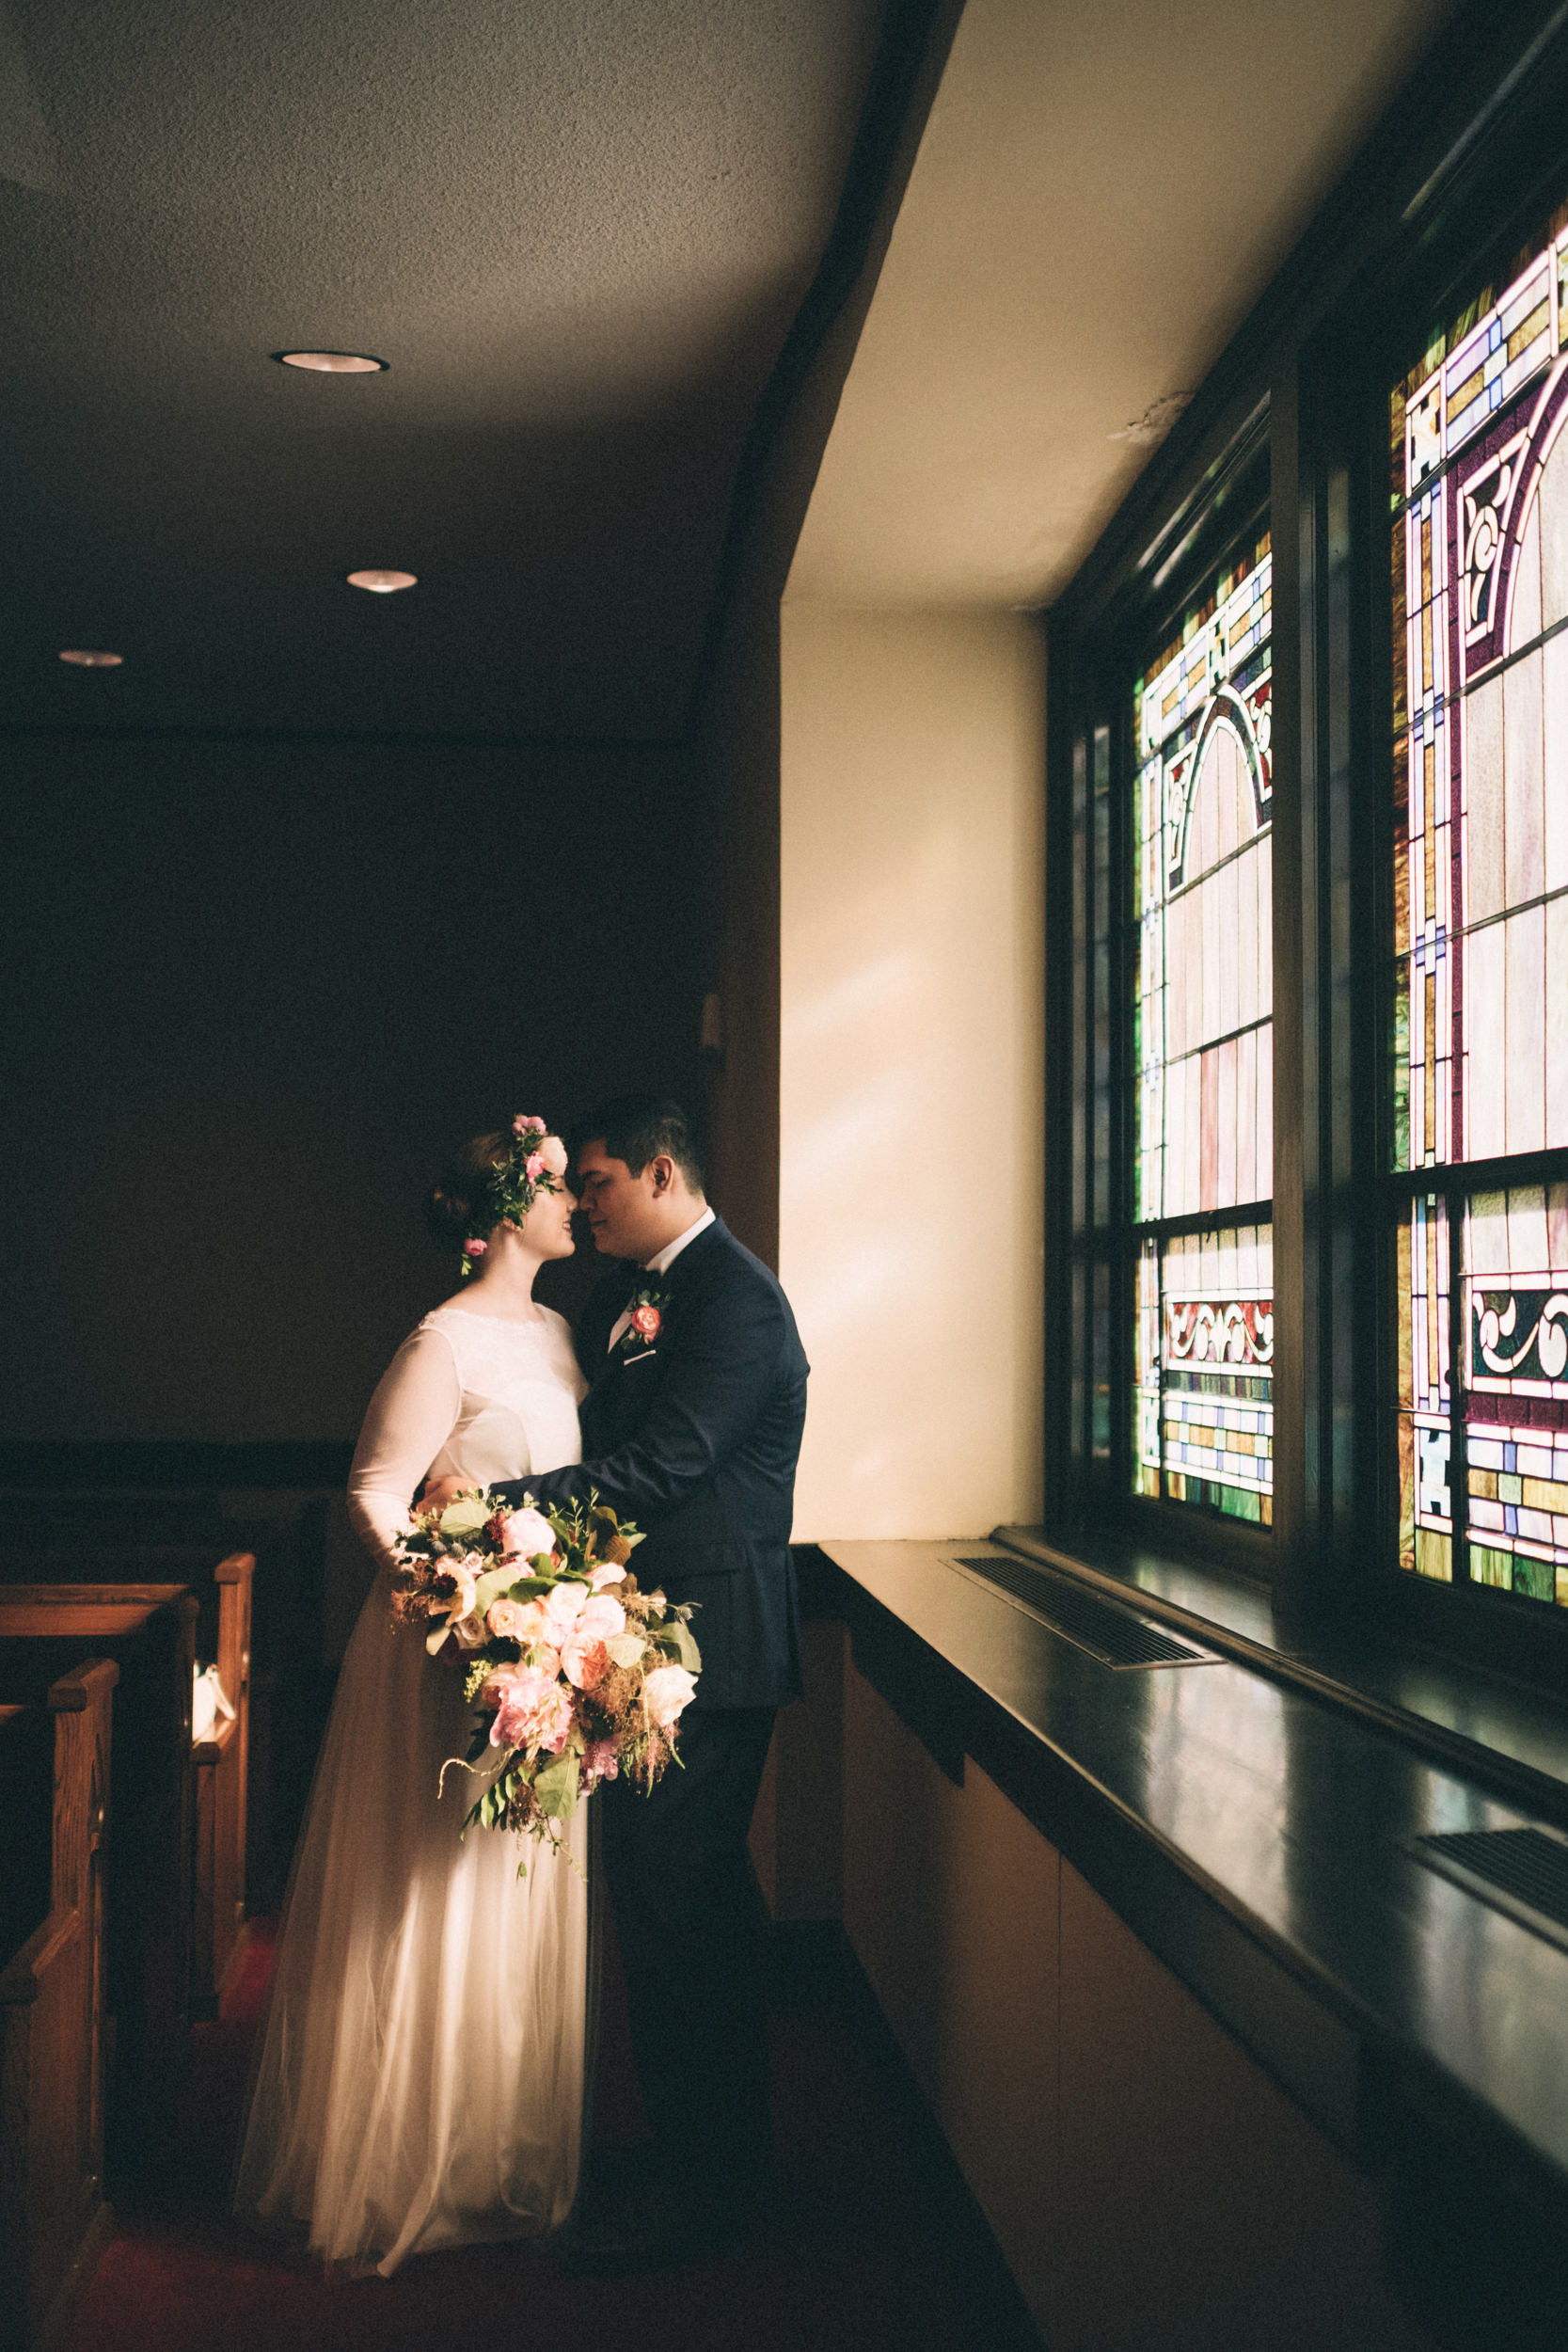 lauren-dean-wedding-grand-lodge-kentucky-sarah-katherine-davis-photography-441edit.jpg